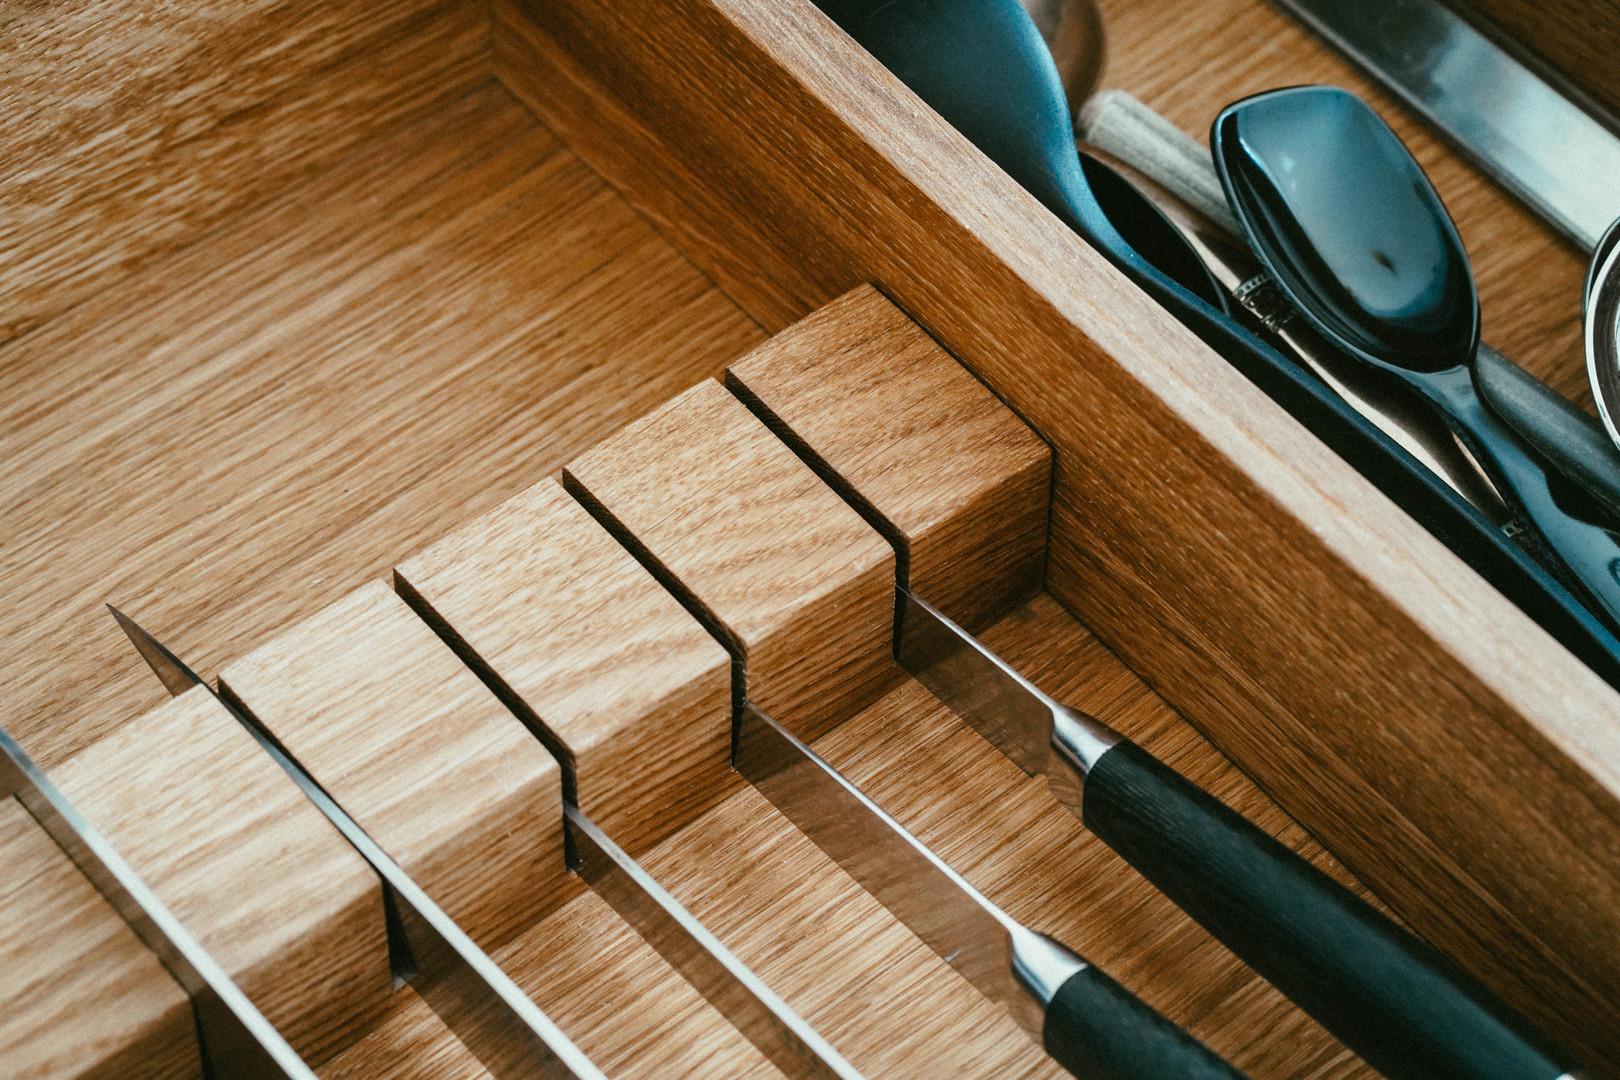 Køkken med malede fronter og fingertappede skuffer